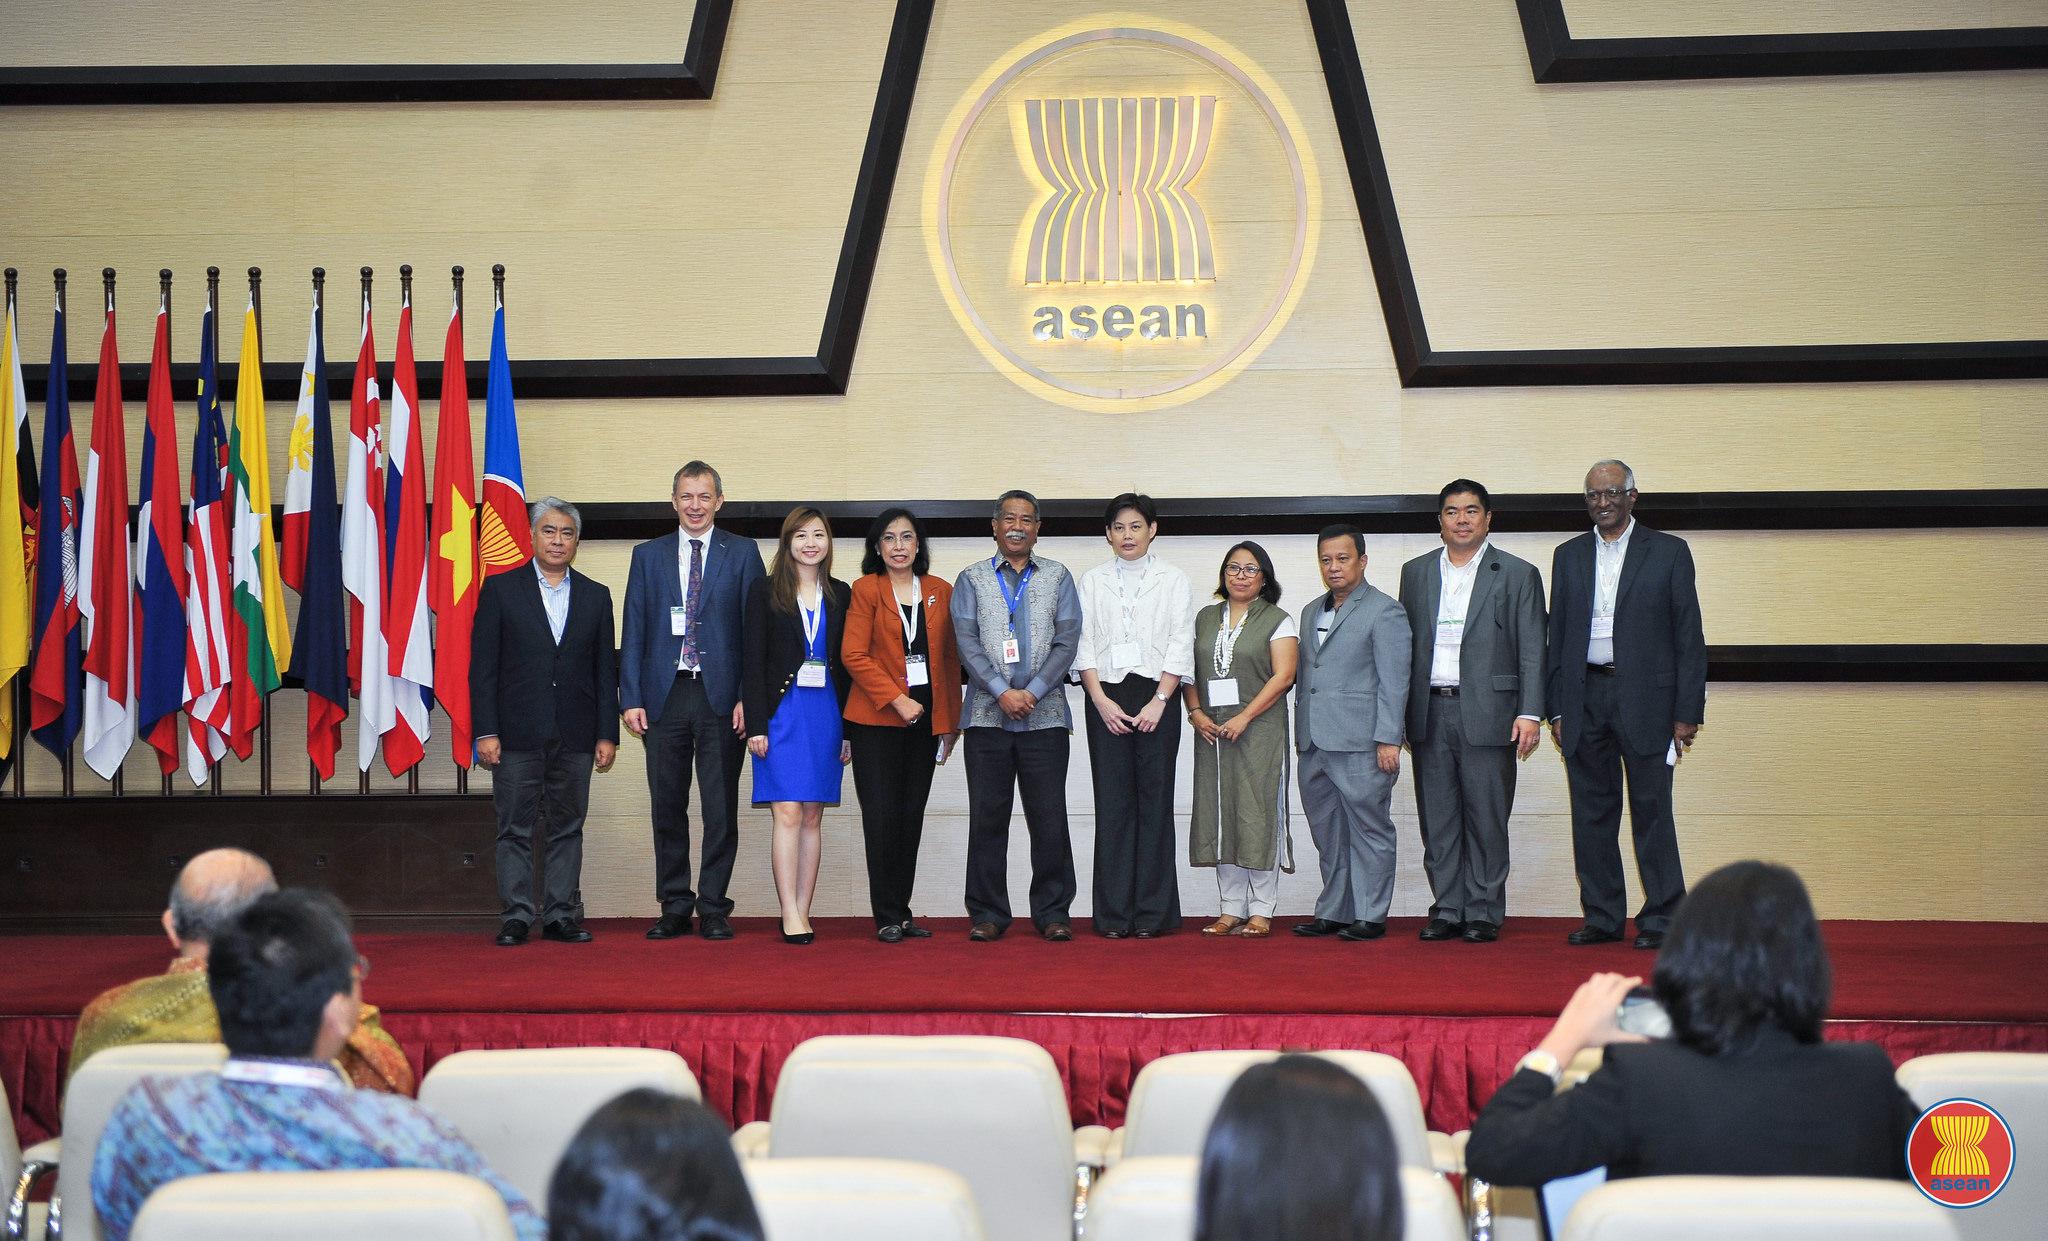 Photo courtesy of ASEAN secretariat